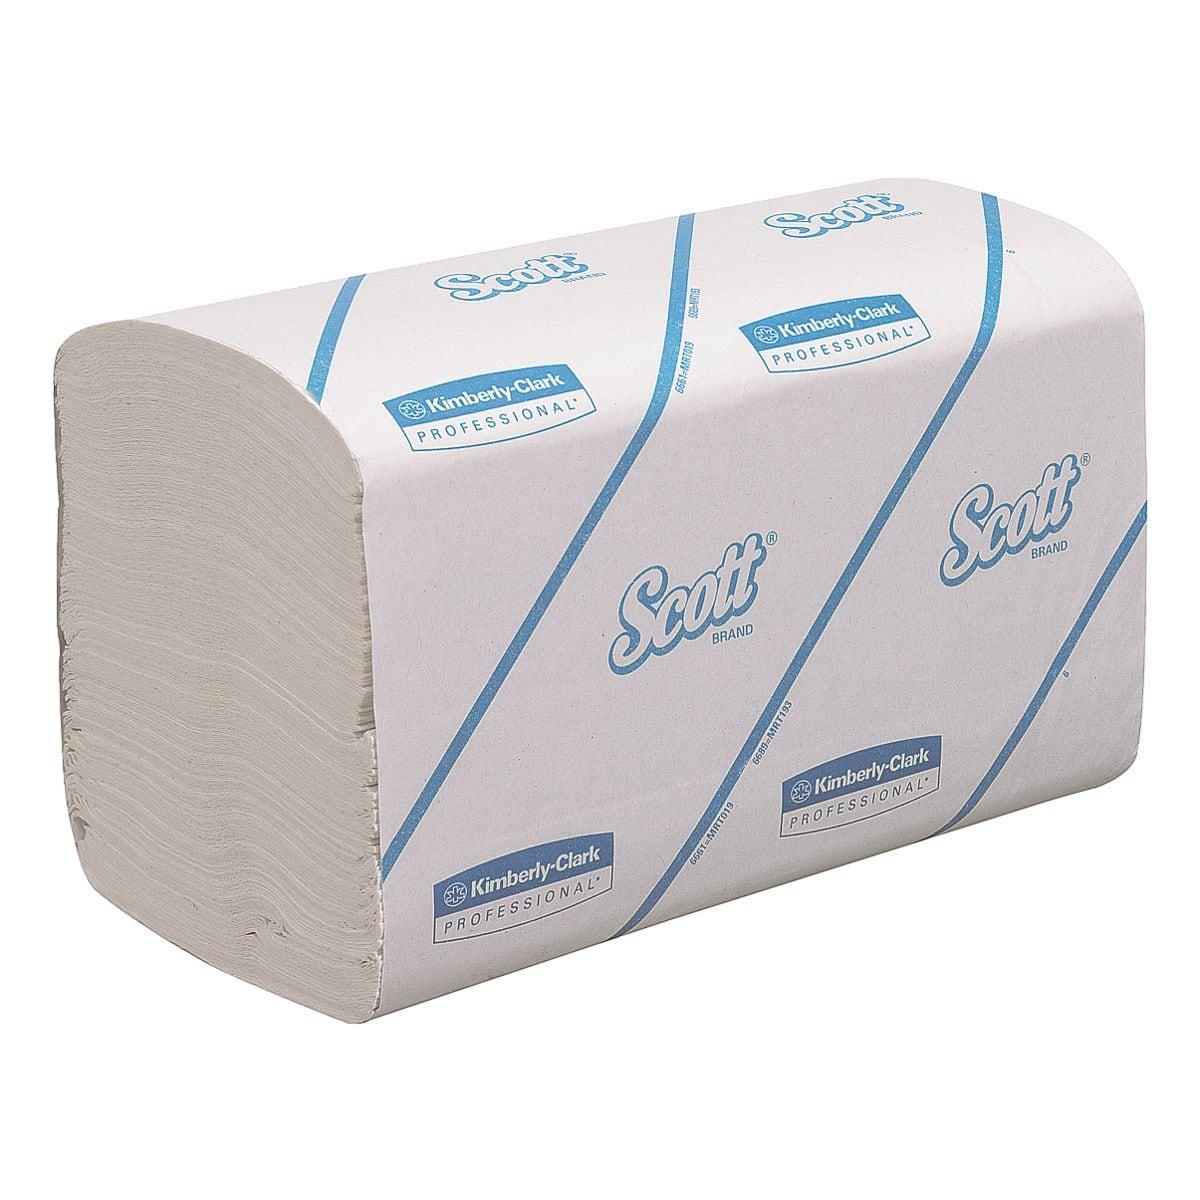 Papierhandtücher Scott Performance 1-lagig, weiß, 21,5 cm x 31,5 cm aus Airflex mit I-Falzung - 3180 Blatt gesamt